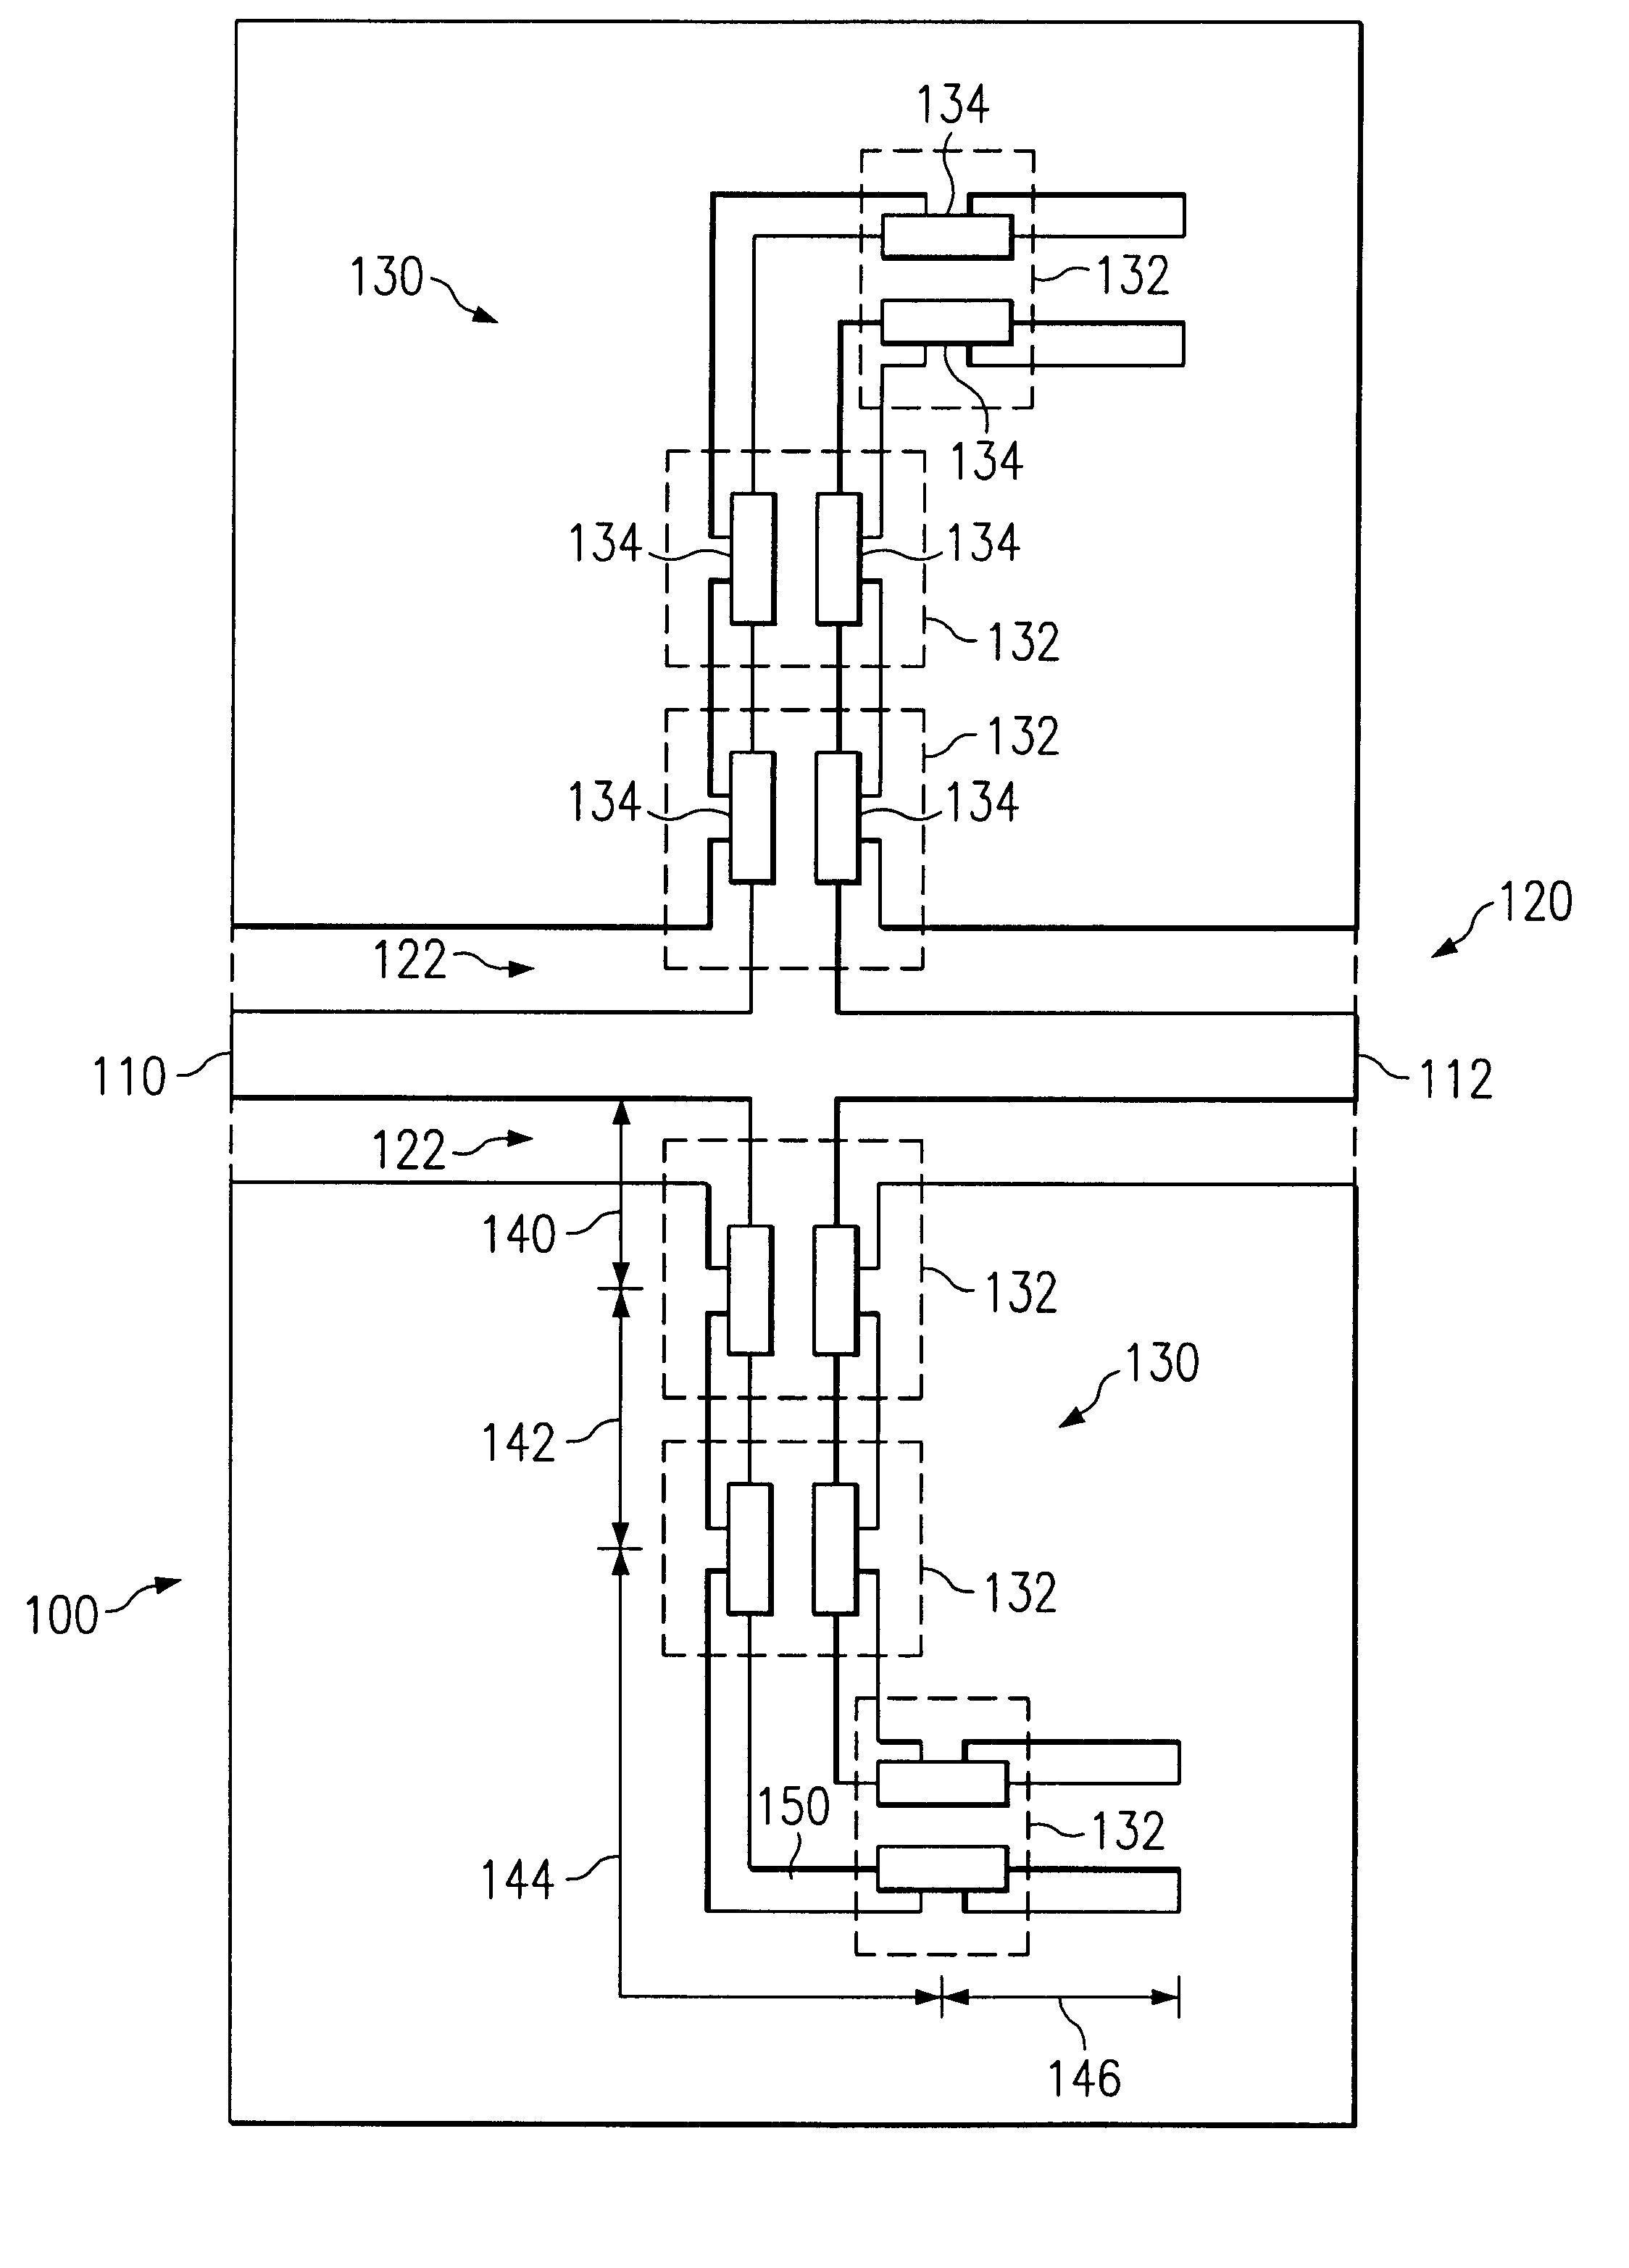 patent us6657518 - notch filter circuit apparatus